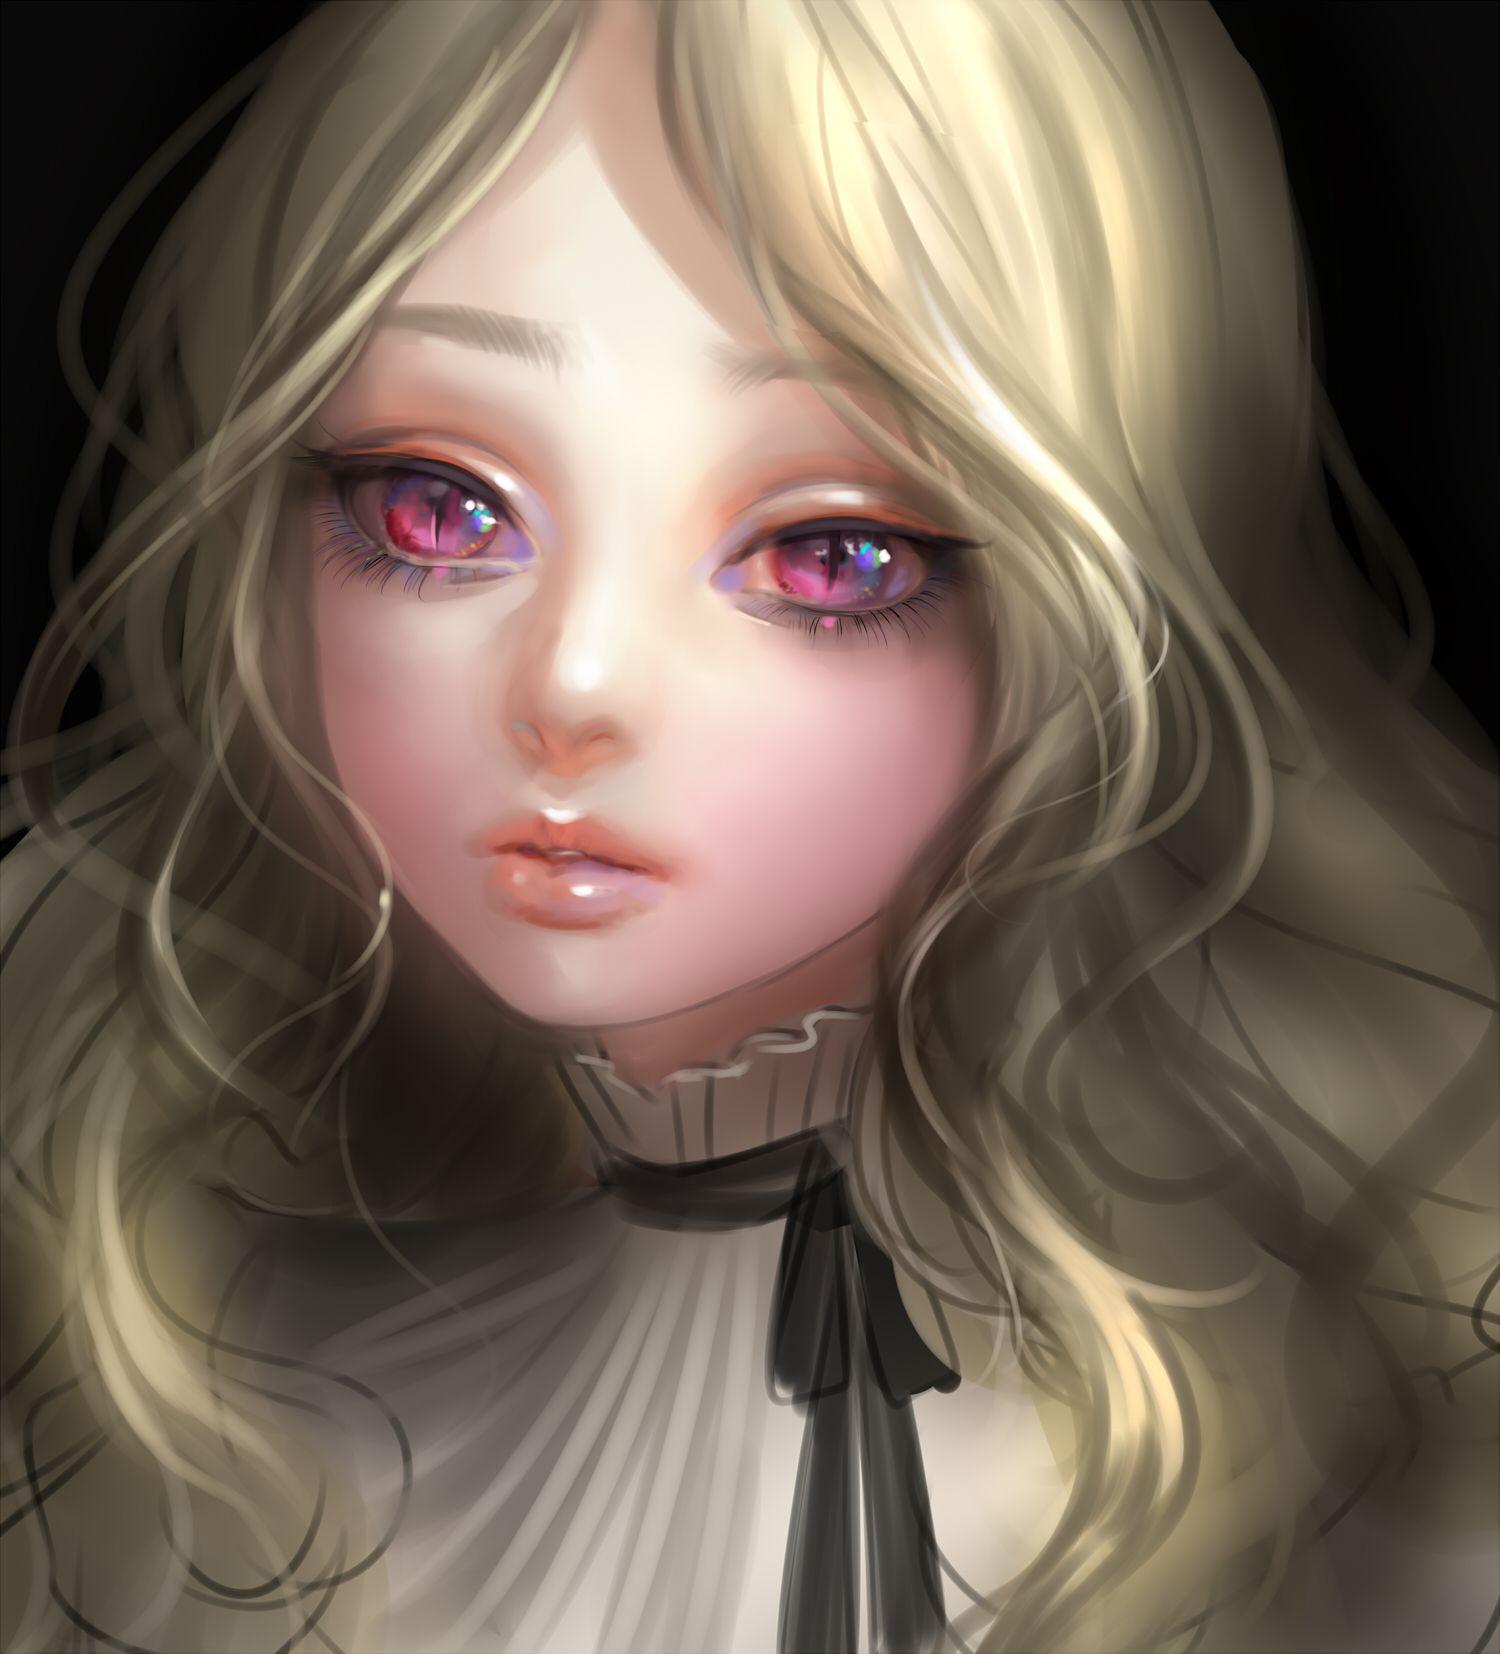 Illustration Anime ANIME ILLUSTRATIONS Pinterest